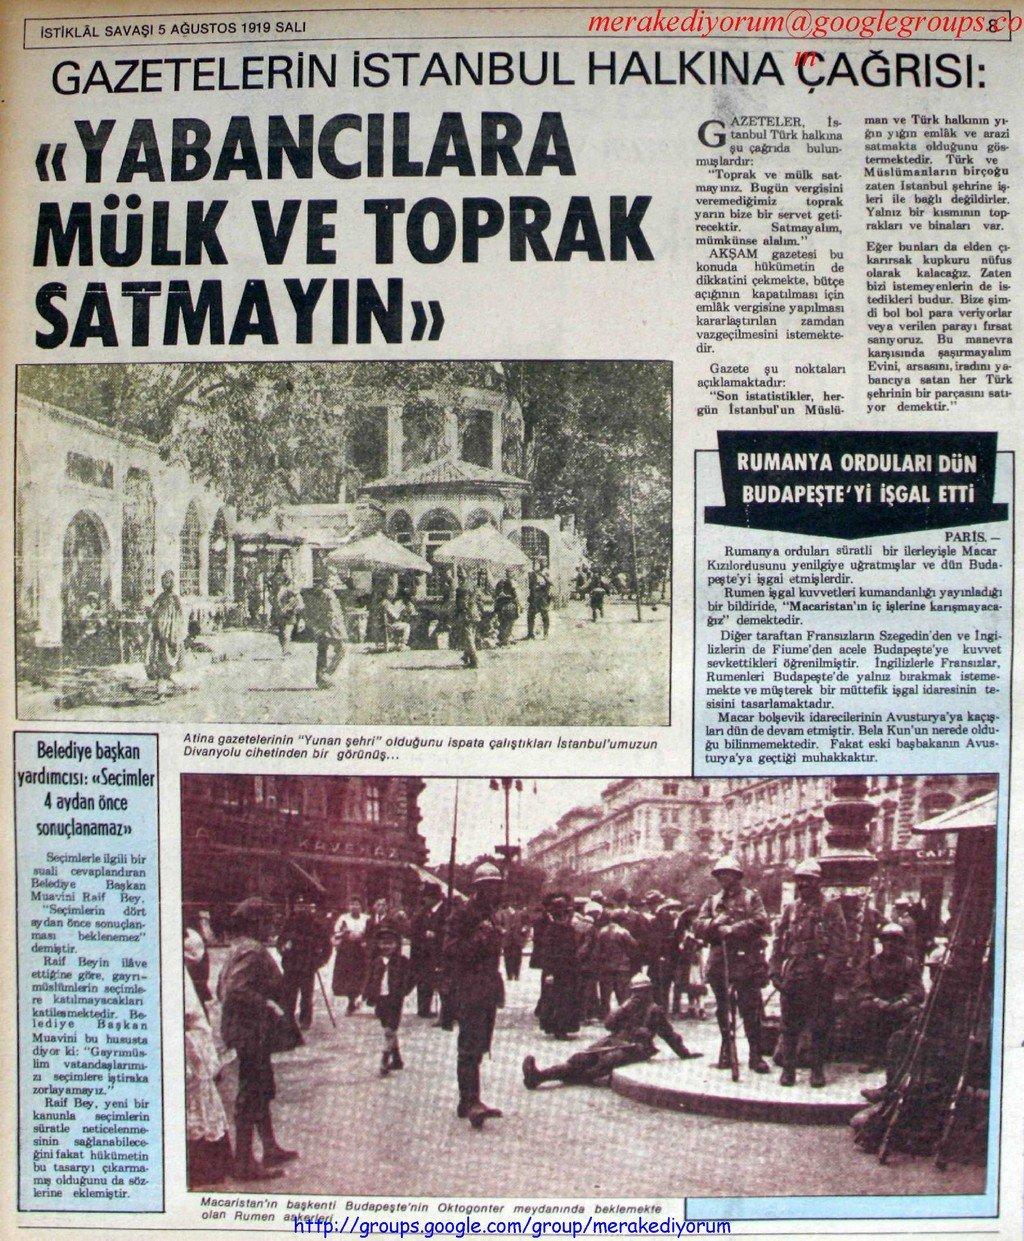 istiklal savaşı gazetesi - 5 ağustos 1919